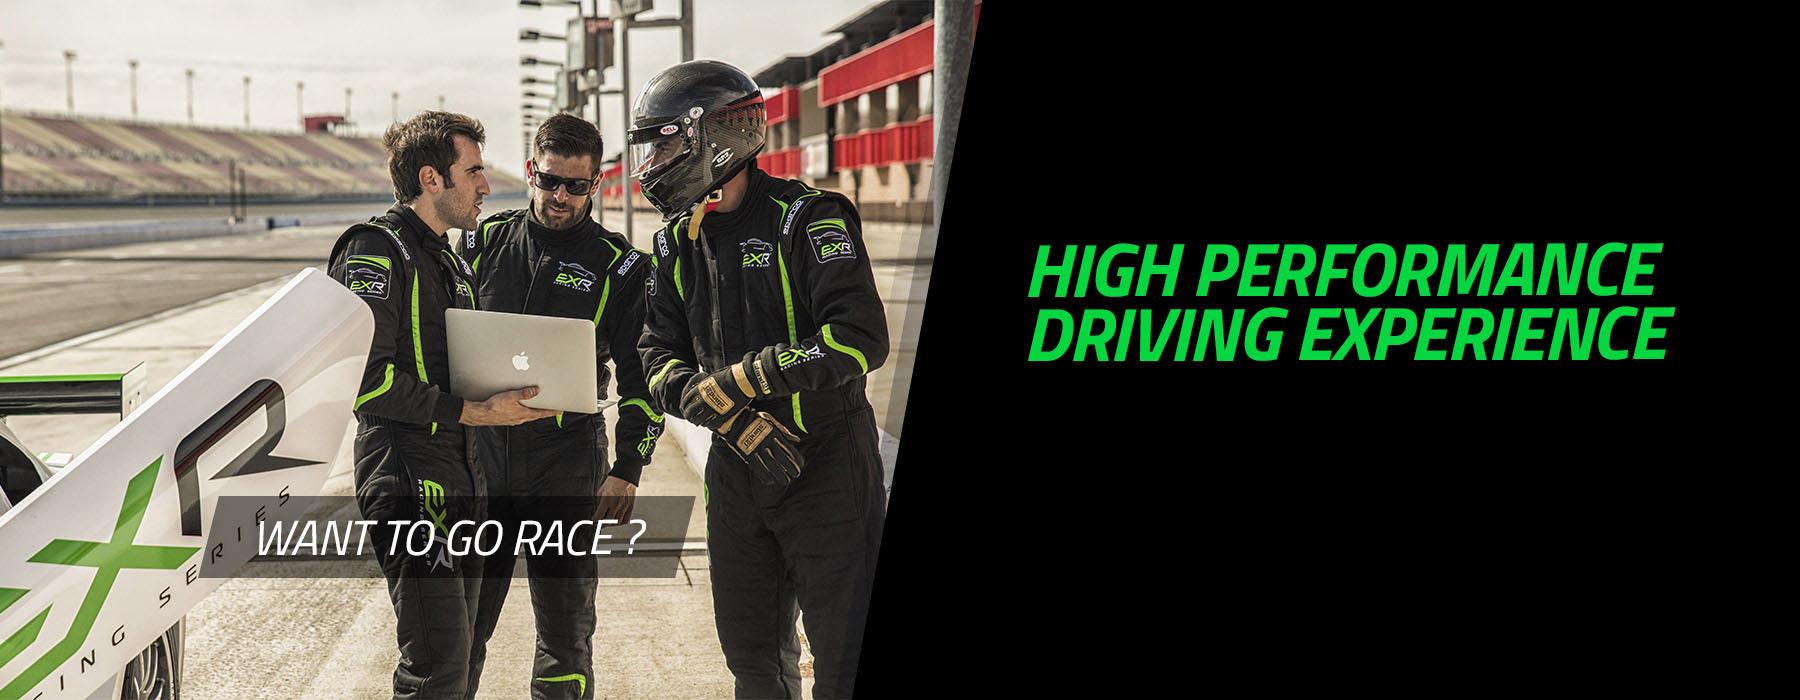 Racing School and HPDE